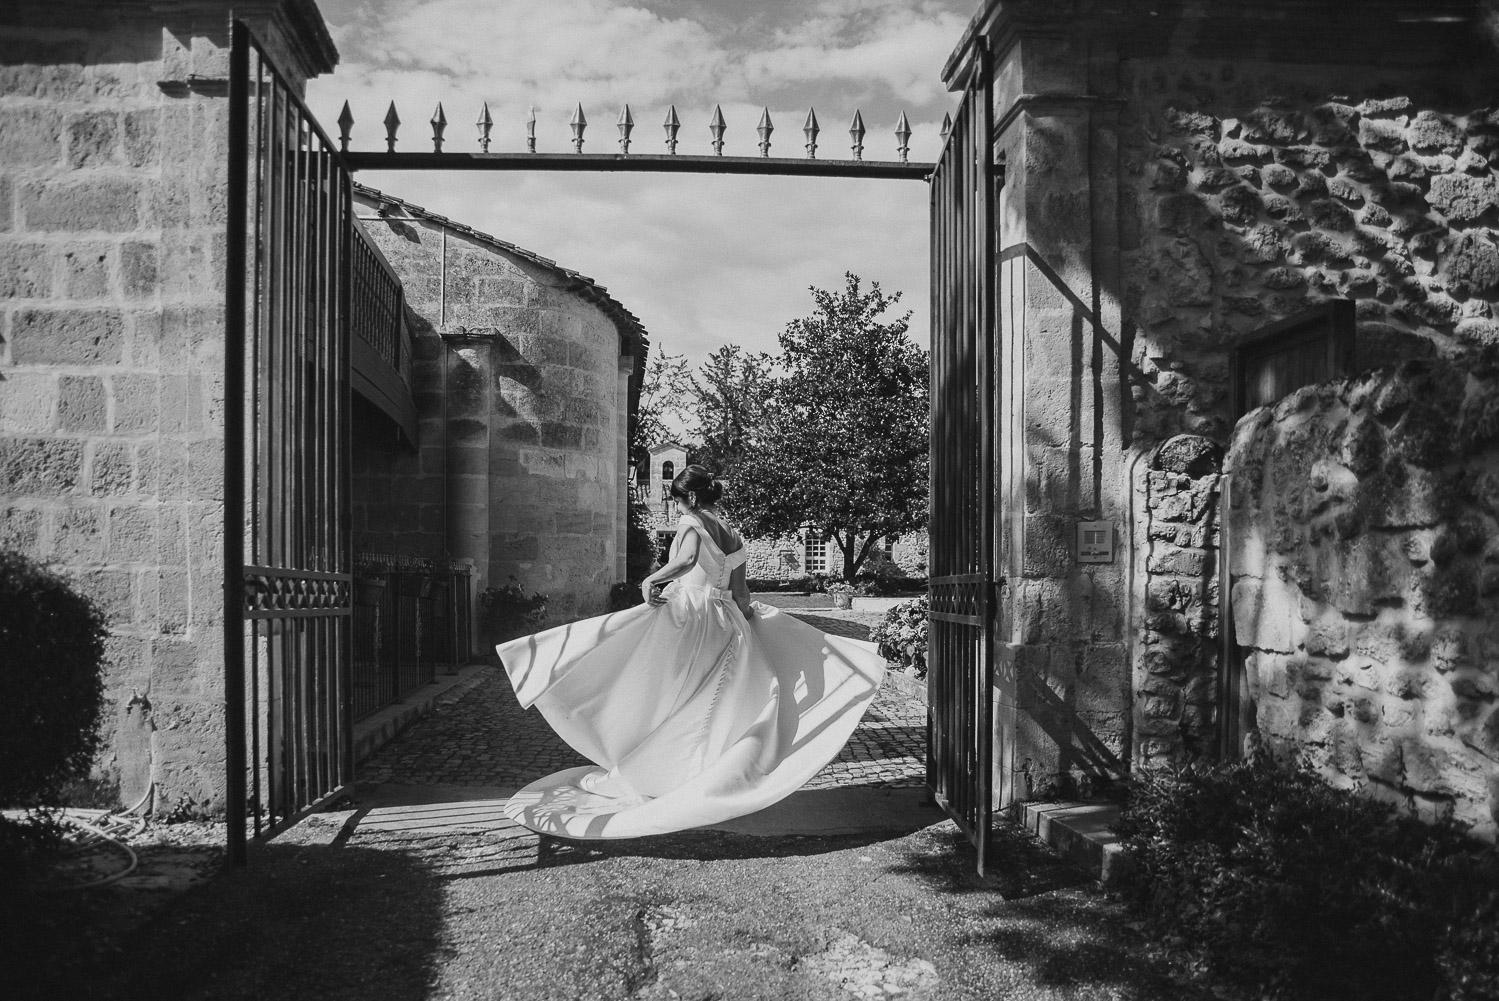 gascony_bordeaux_south_west_france_wedding_tarn_katy_webb_photography_UK82